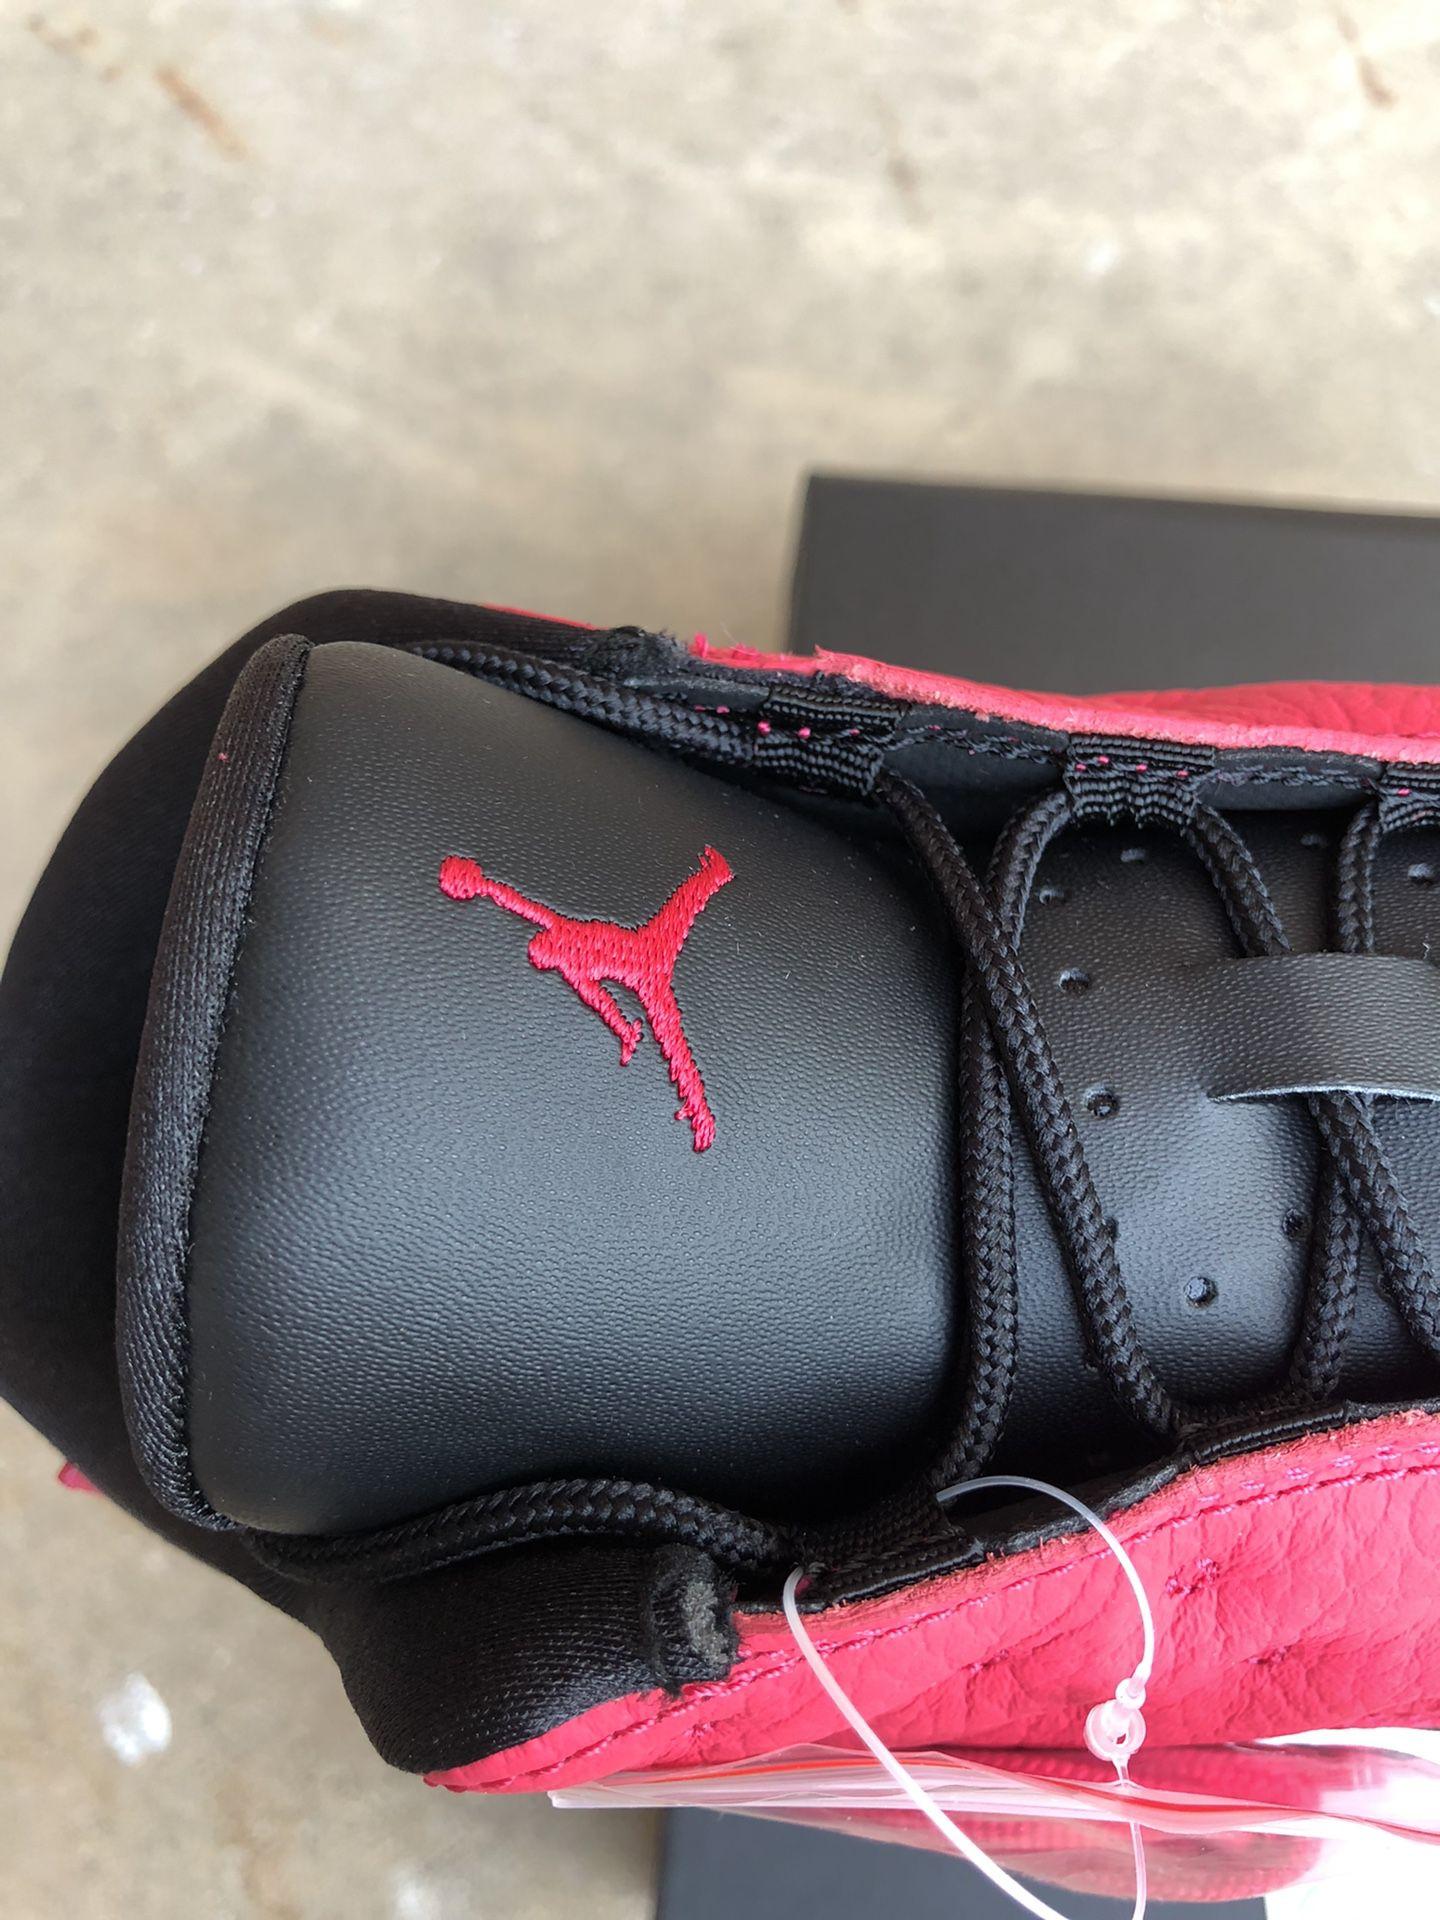 Air Jordan Retro 13 Low Very Berry Size 7 GS